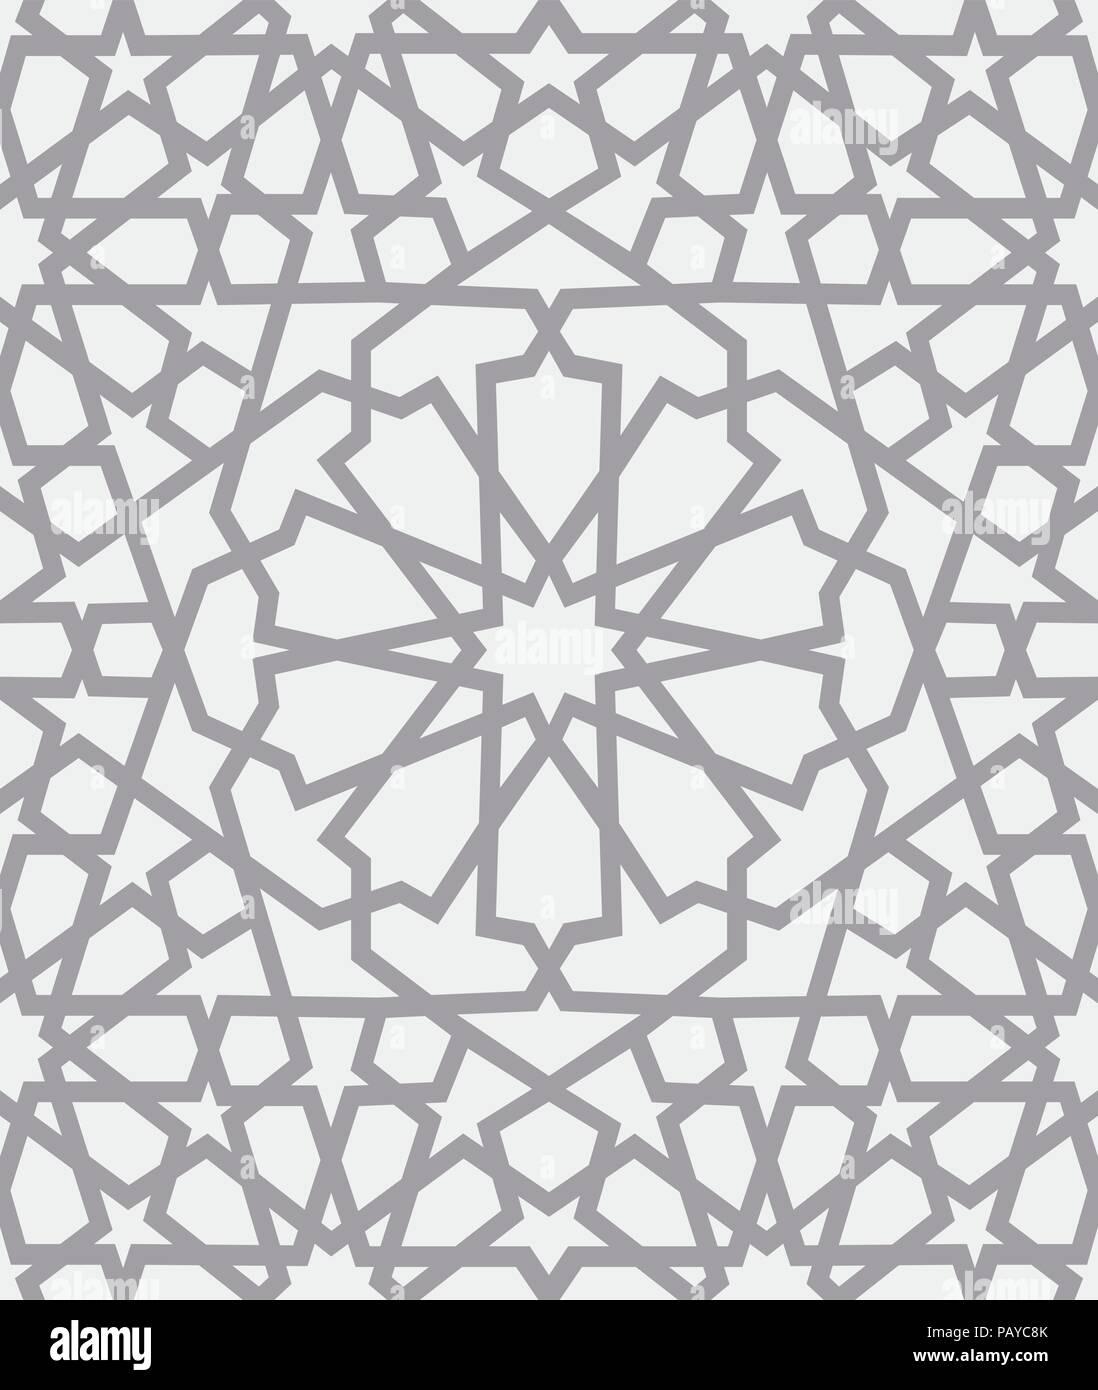 Islamic Vintage Floral Pattern Template Imágenes De Stock & Islamic ...